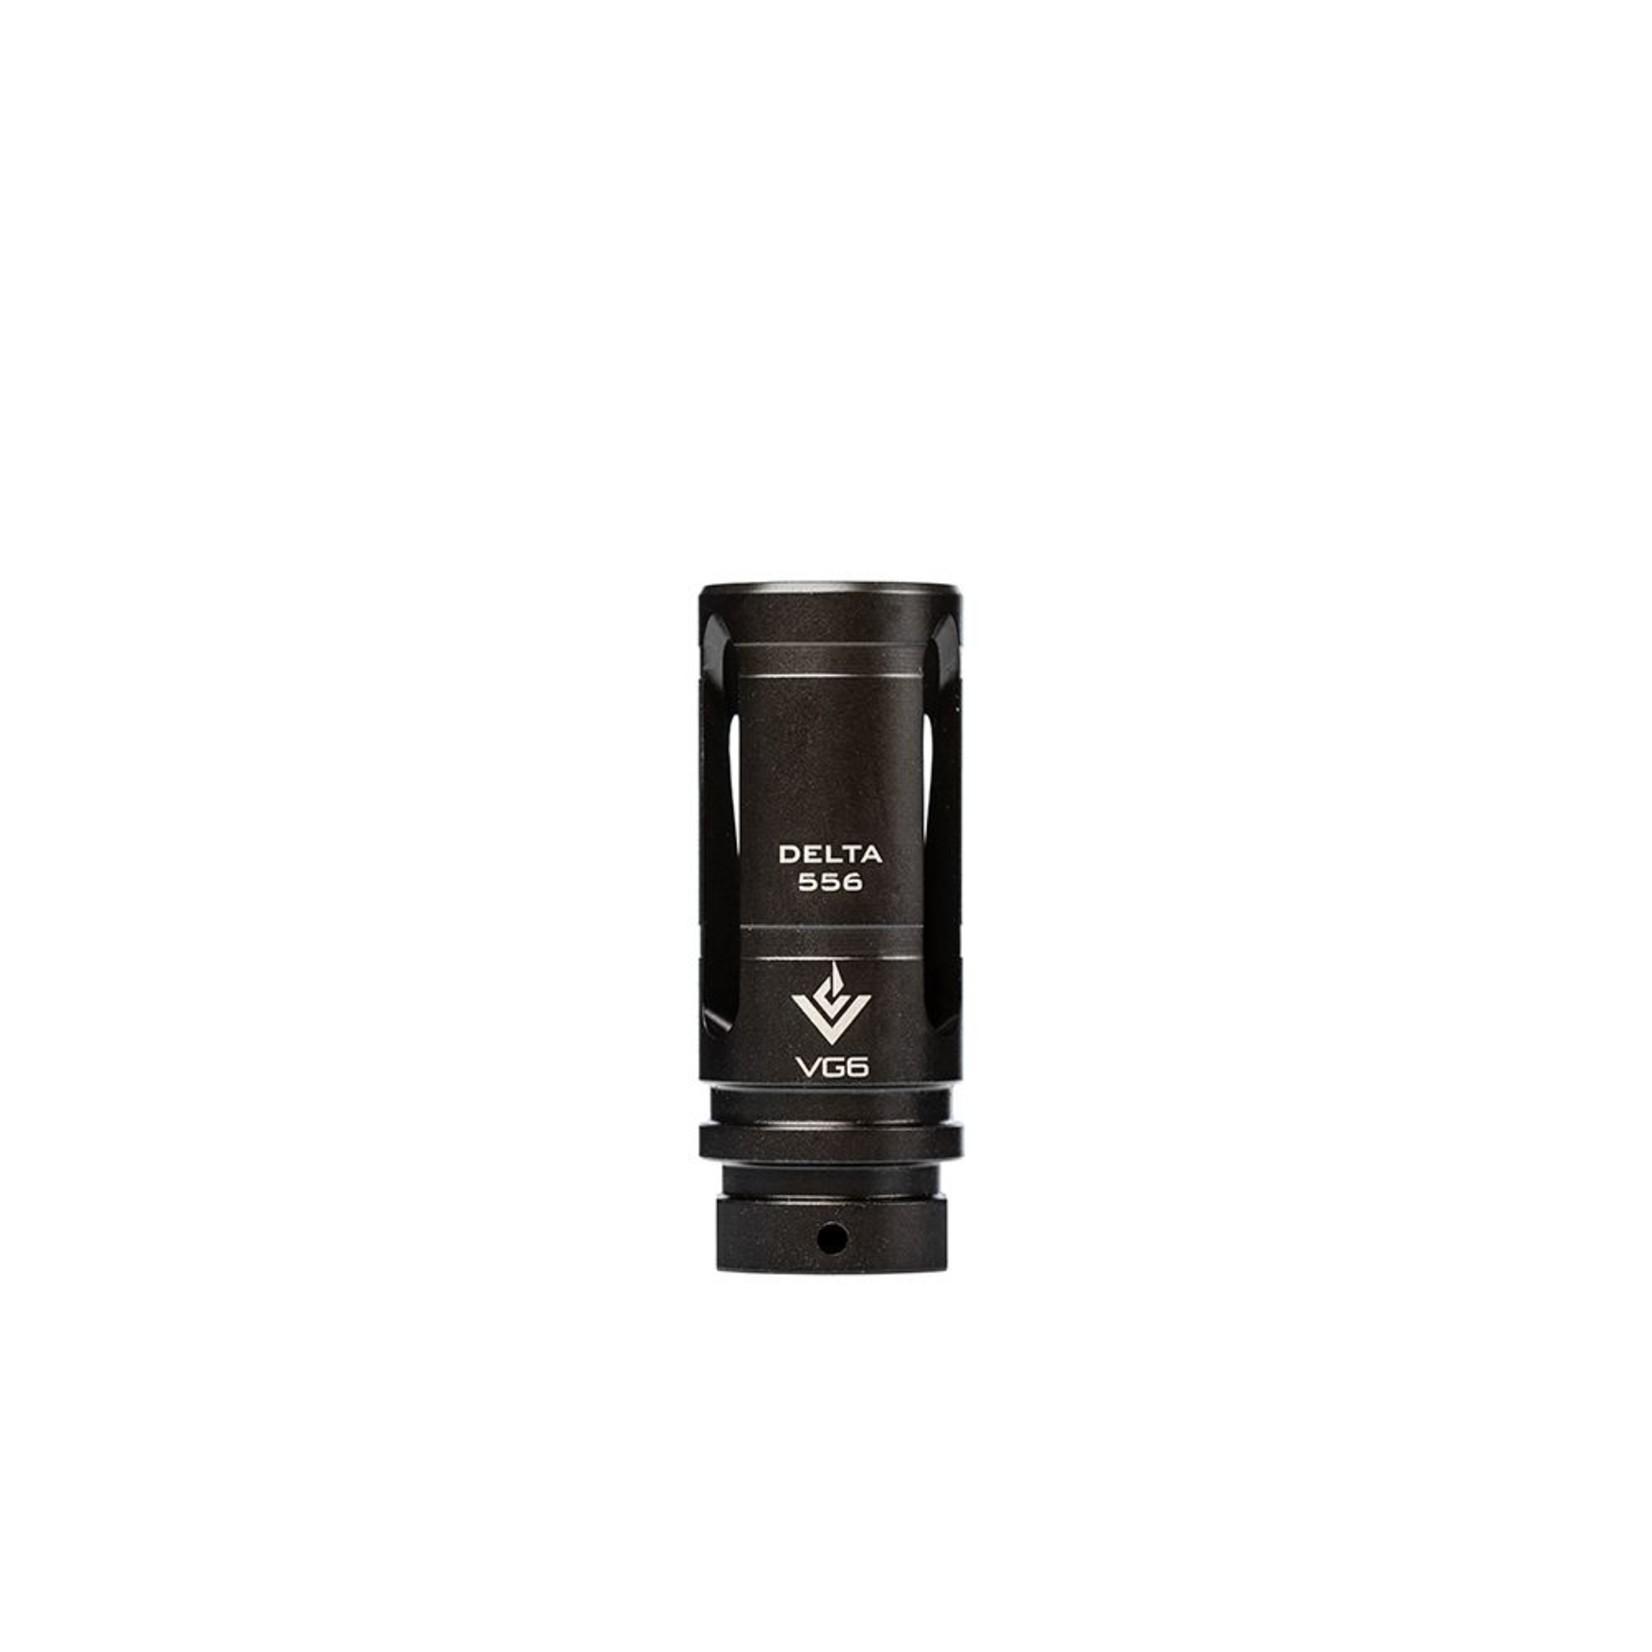 VG6 VG6 Delta Muzzle Break 5.56